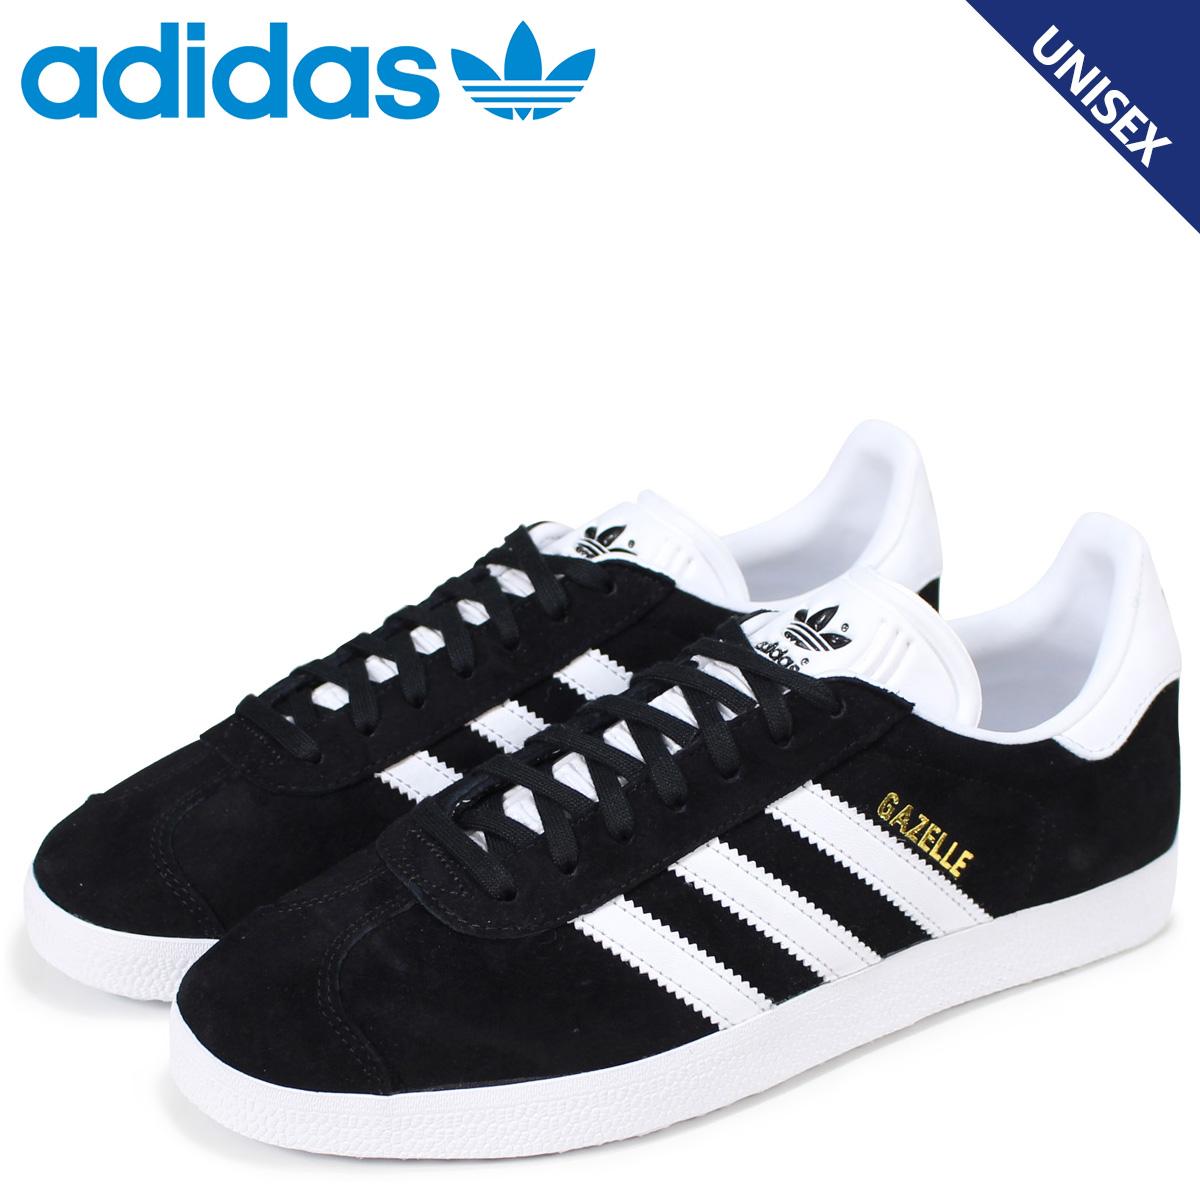 gazelle adidas shop online